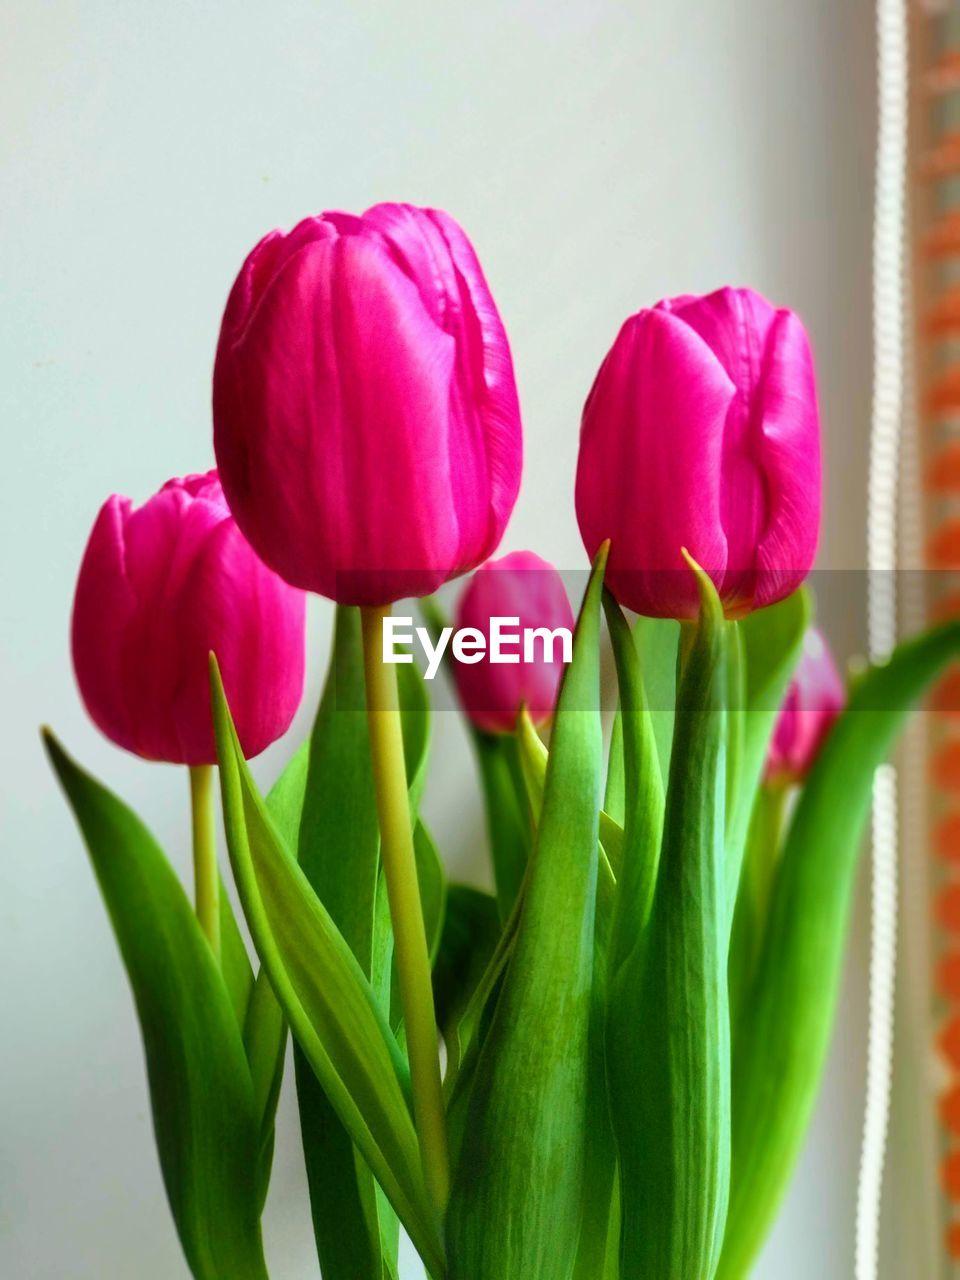 flower, flowering plant, plant, freshness, beauty in nature, tulip, fragility, vulnerability, close-up, petal, plant part, leaf, flower head, indoors, nature, green color, inflorescence, pink color, no people, vase, flower arrangement, purple, bunch of flowers